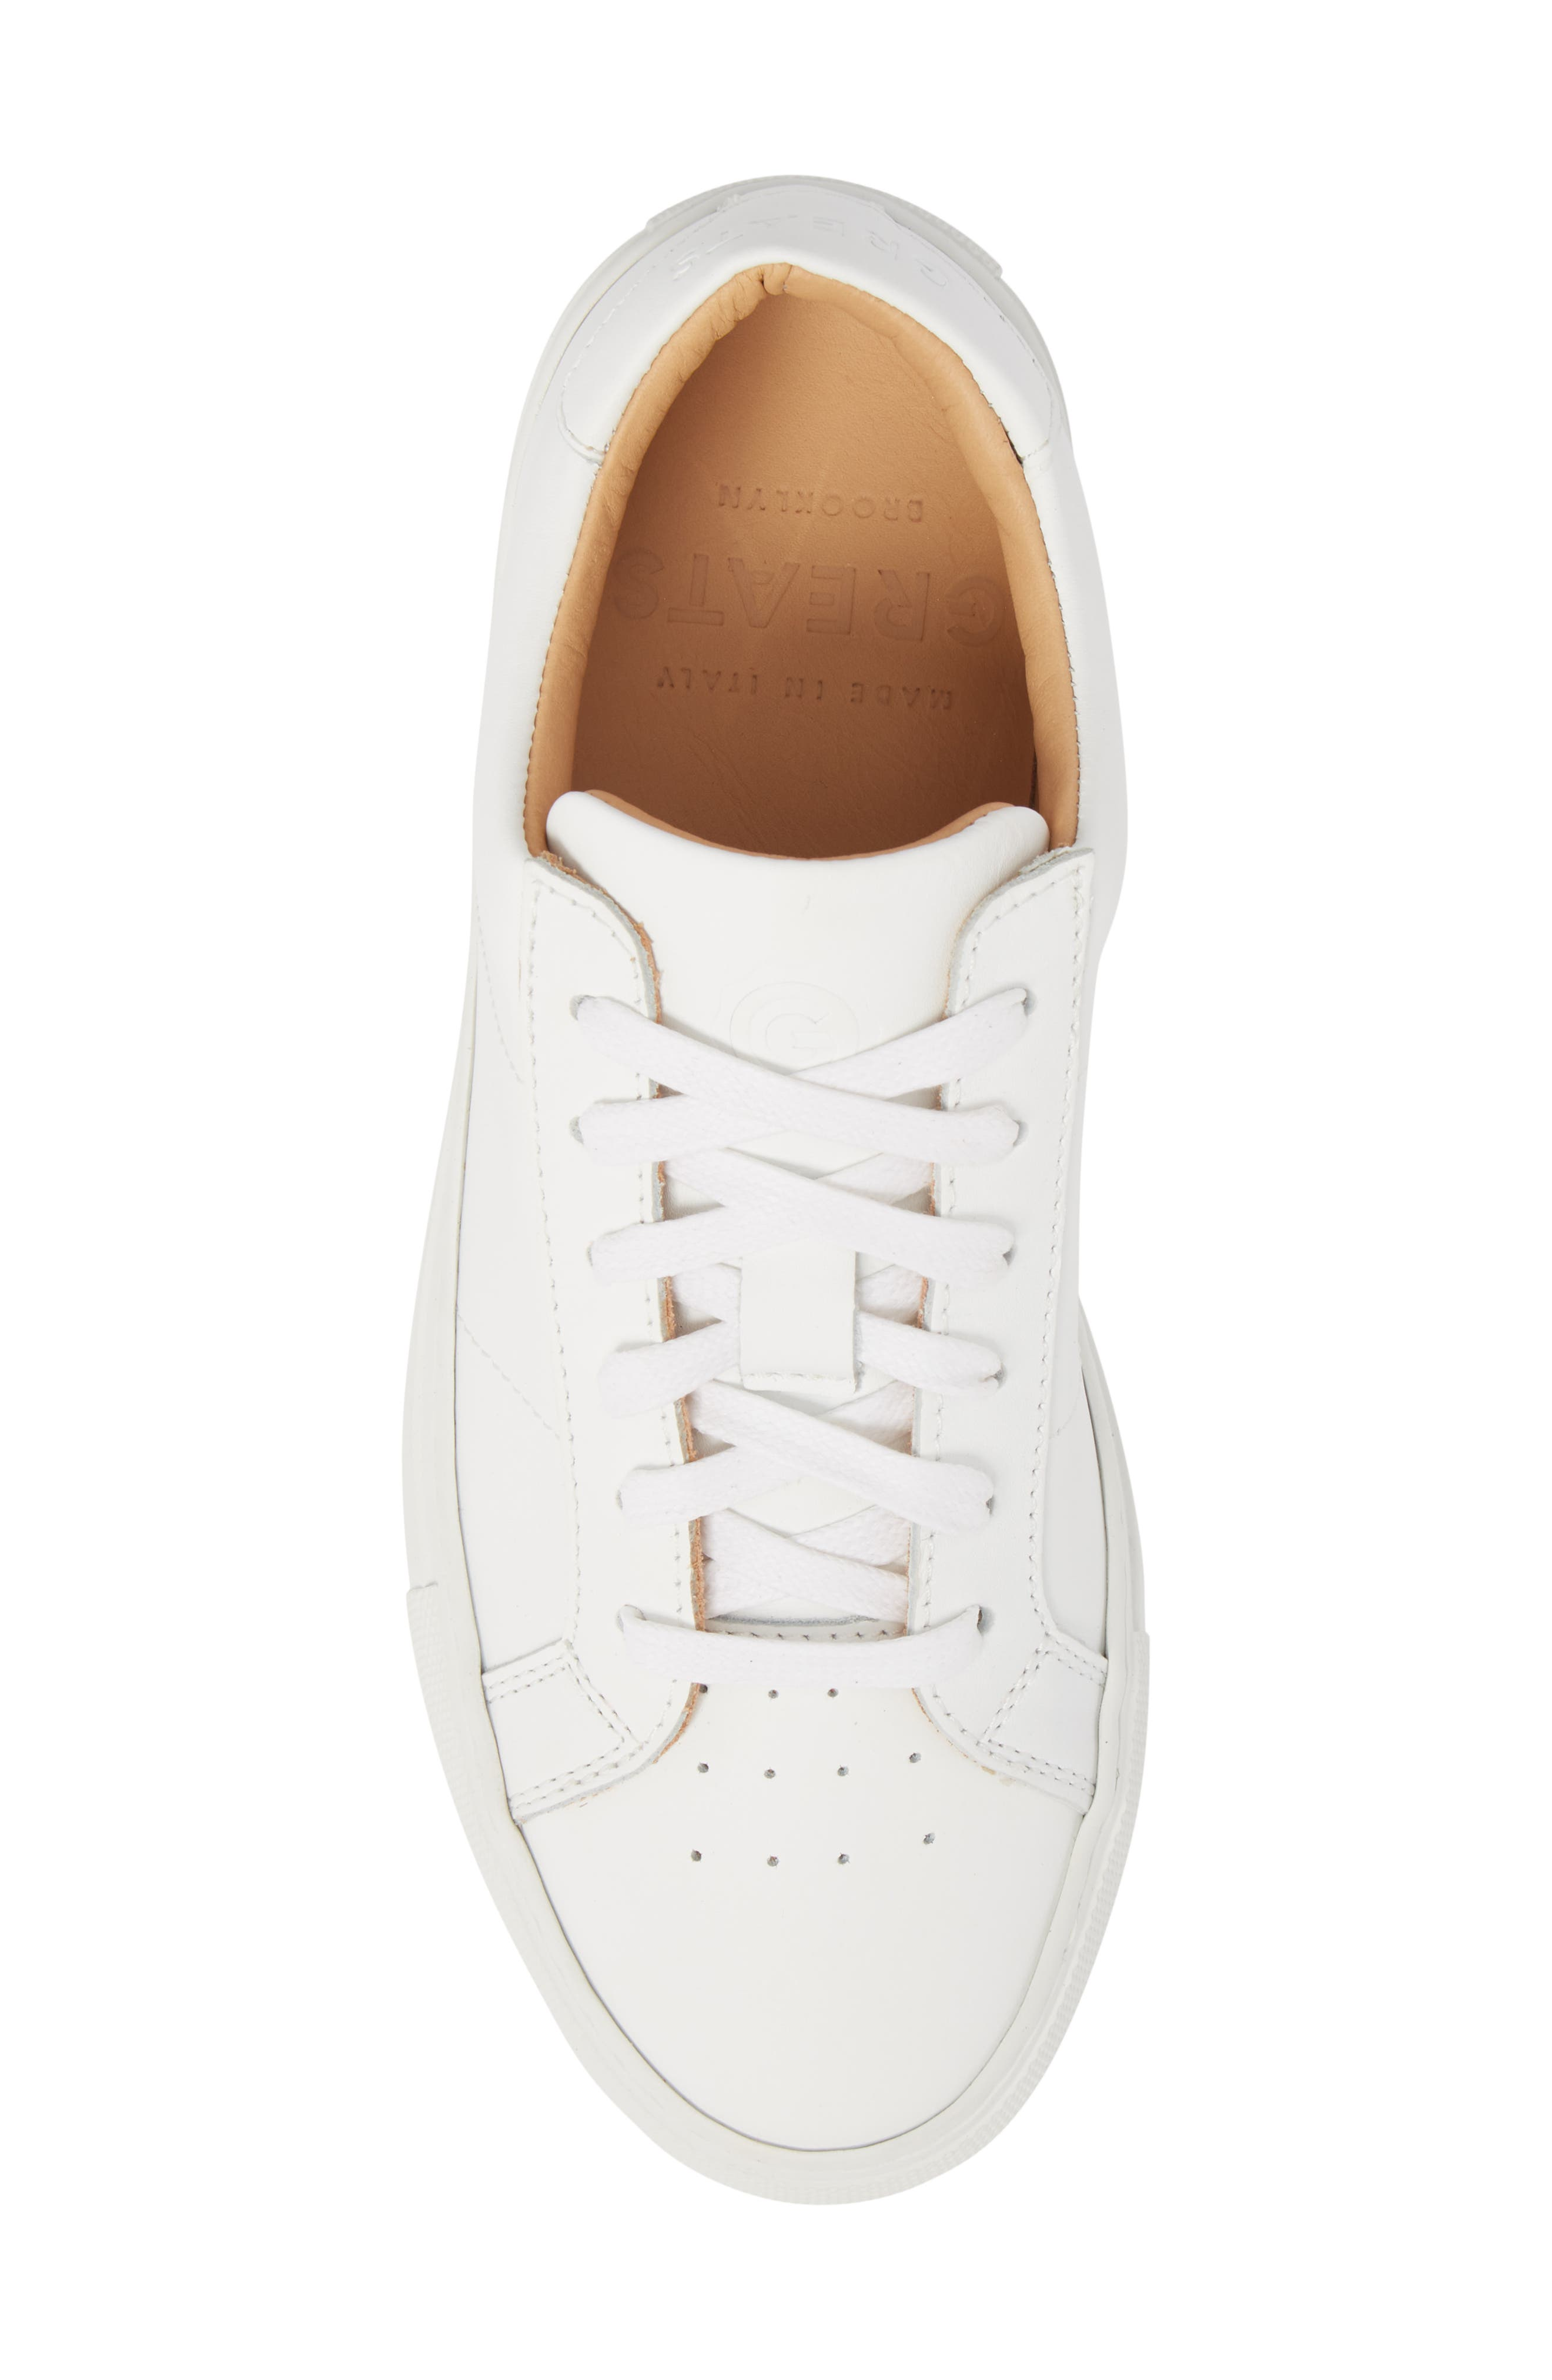 Royale Sneaker,                             Alternate thumbnail 5, color,                             White Flat Leather